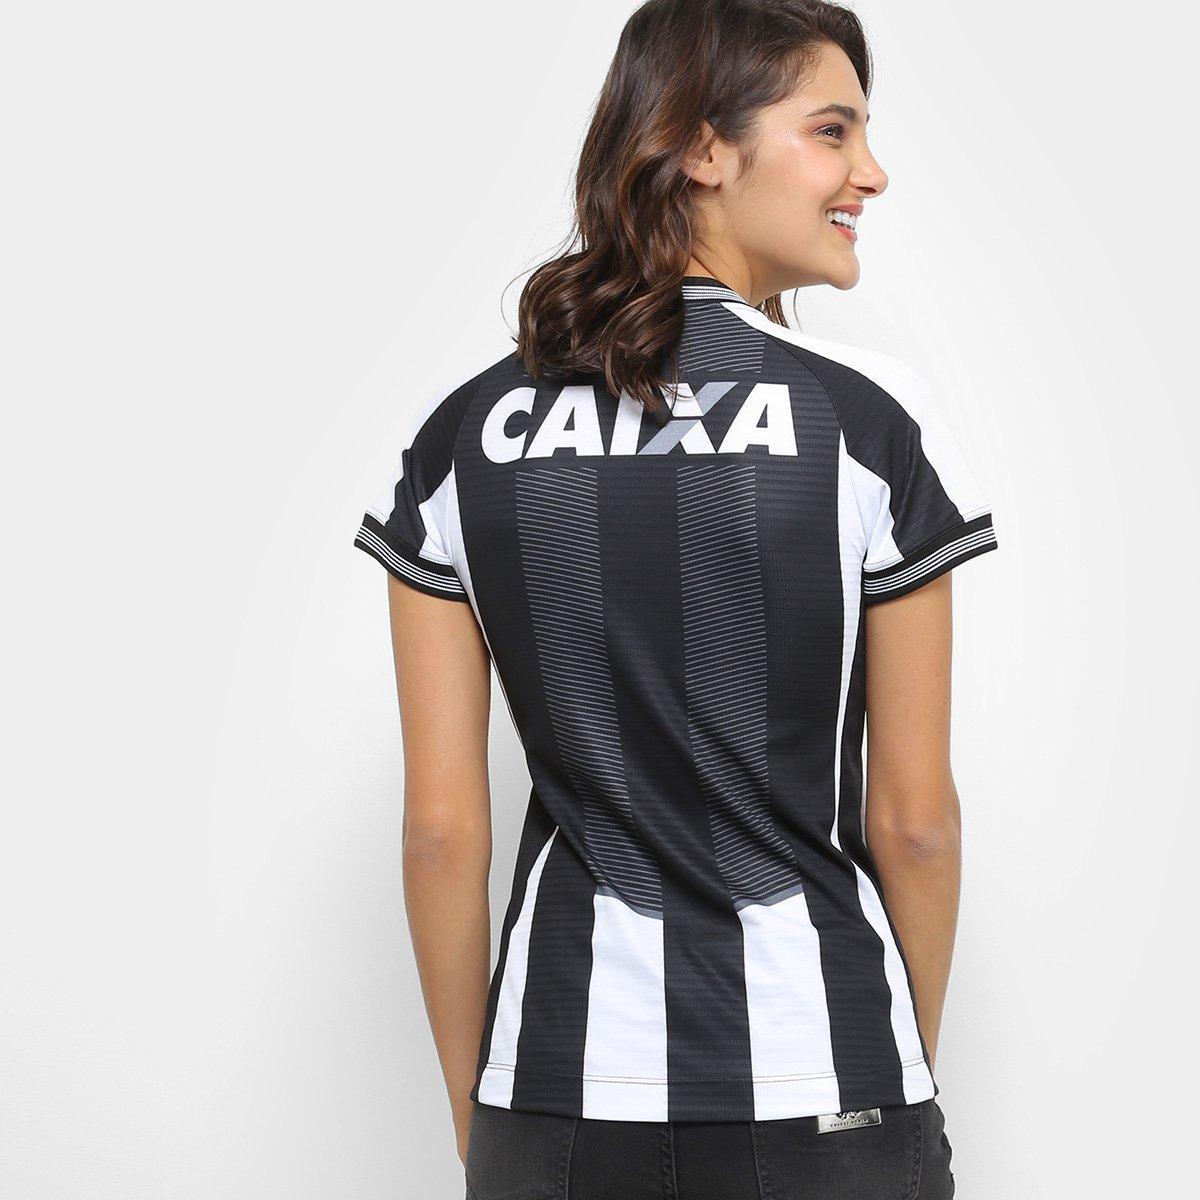 71b036a11f Camisa Botafogo I 2018 s n° Torcedor Topper Feminina - Preto e ...